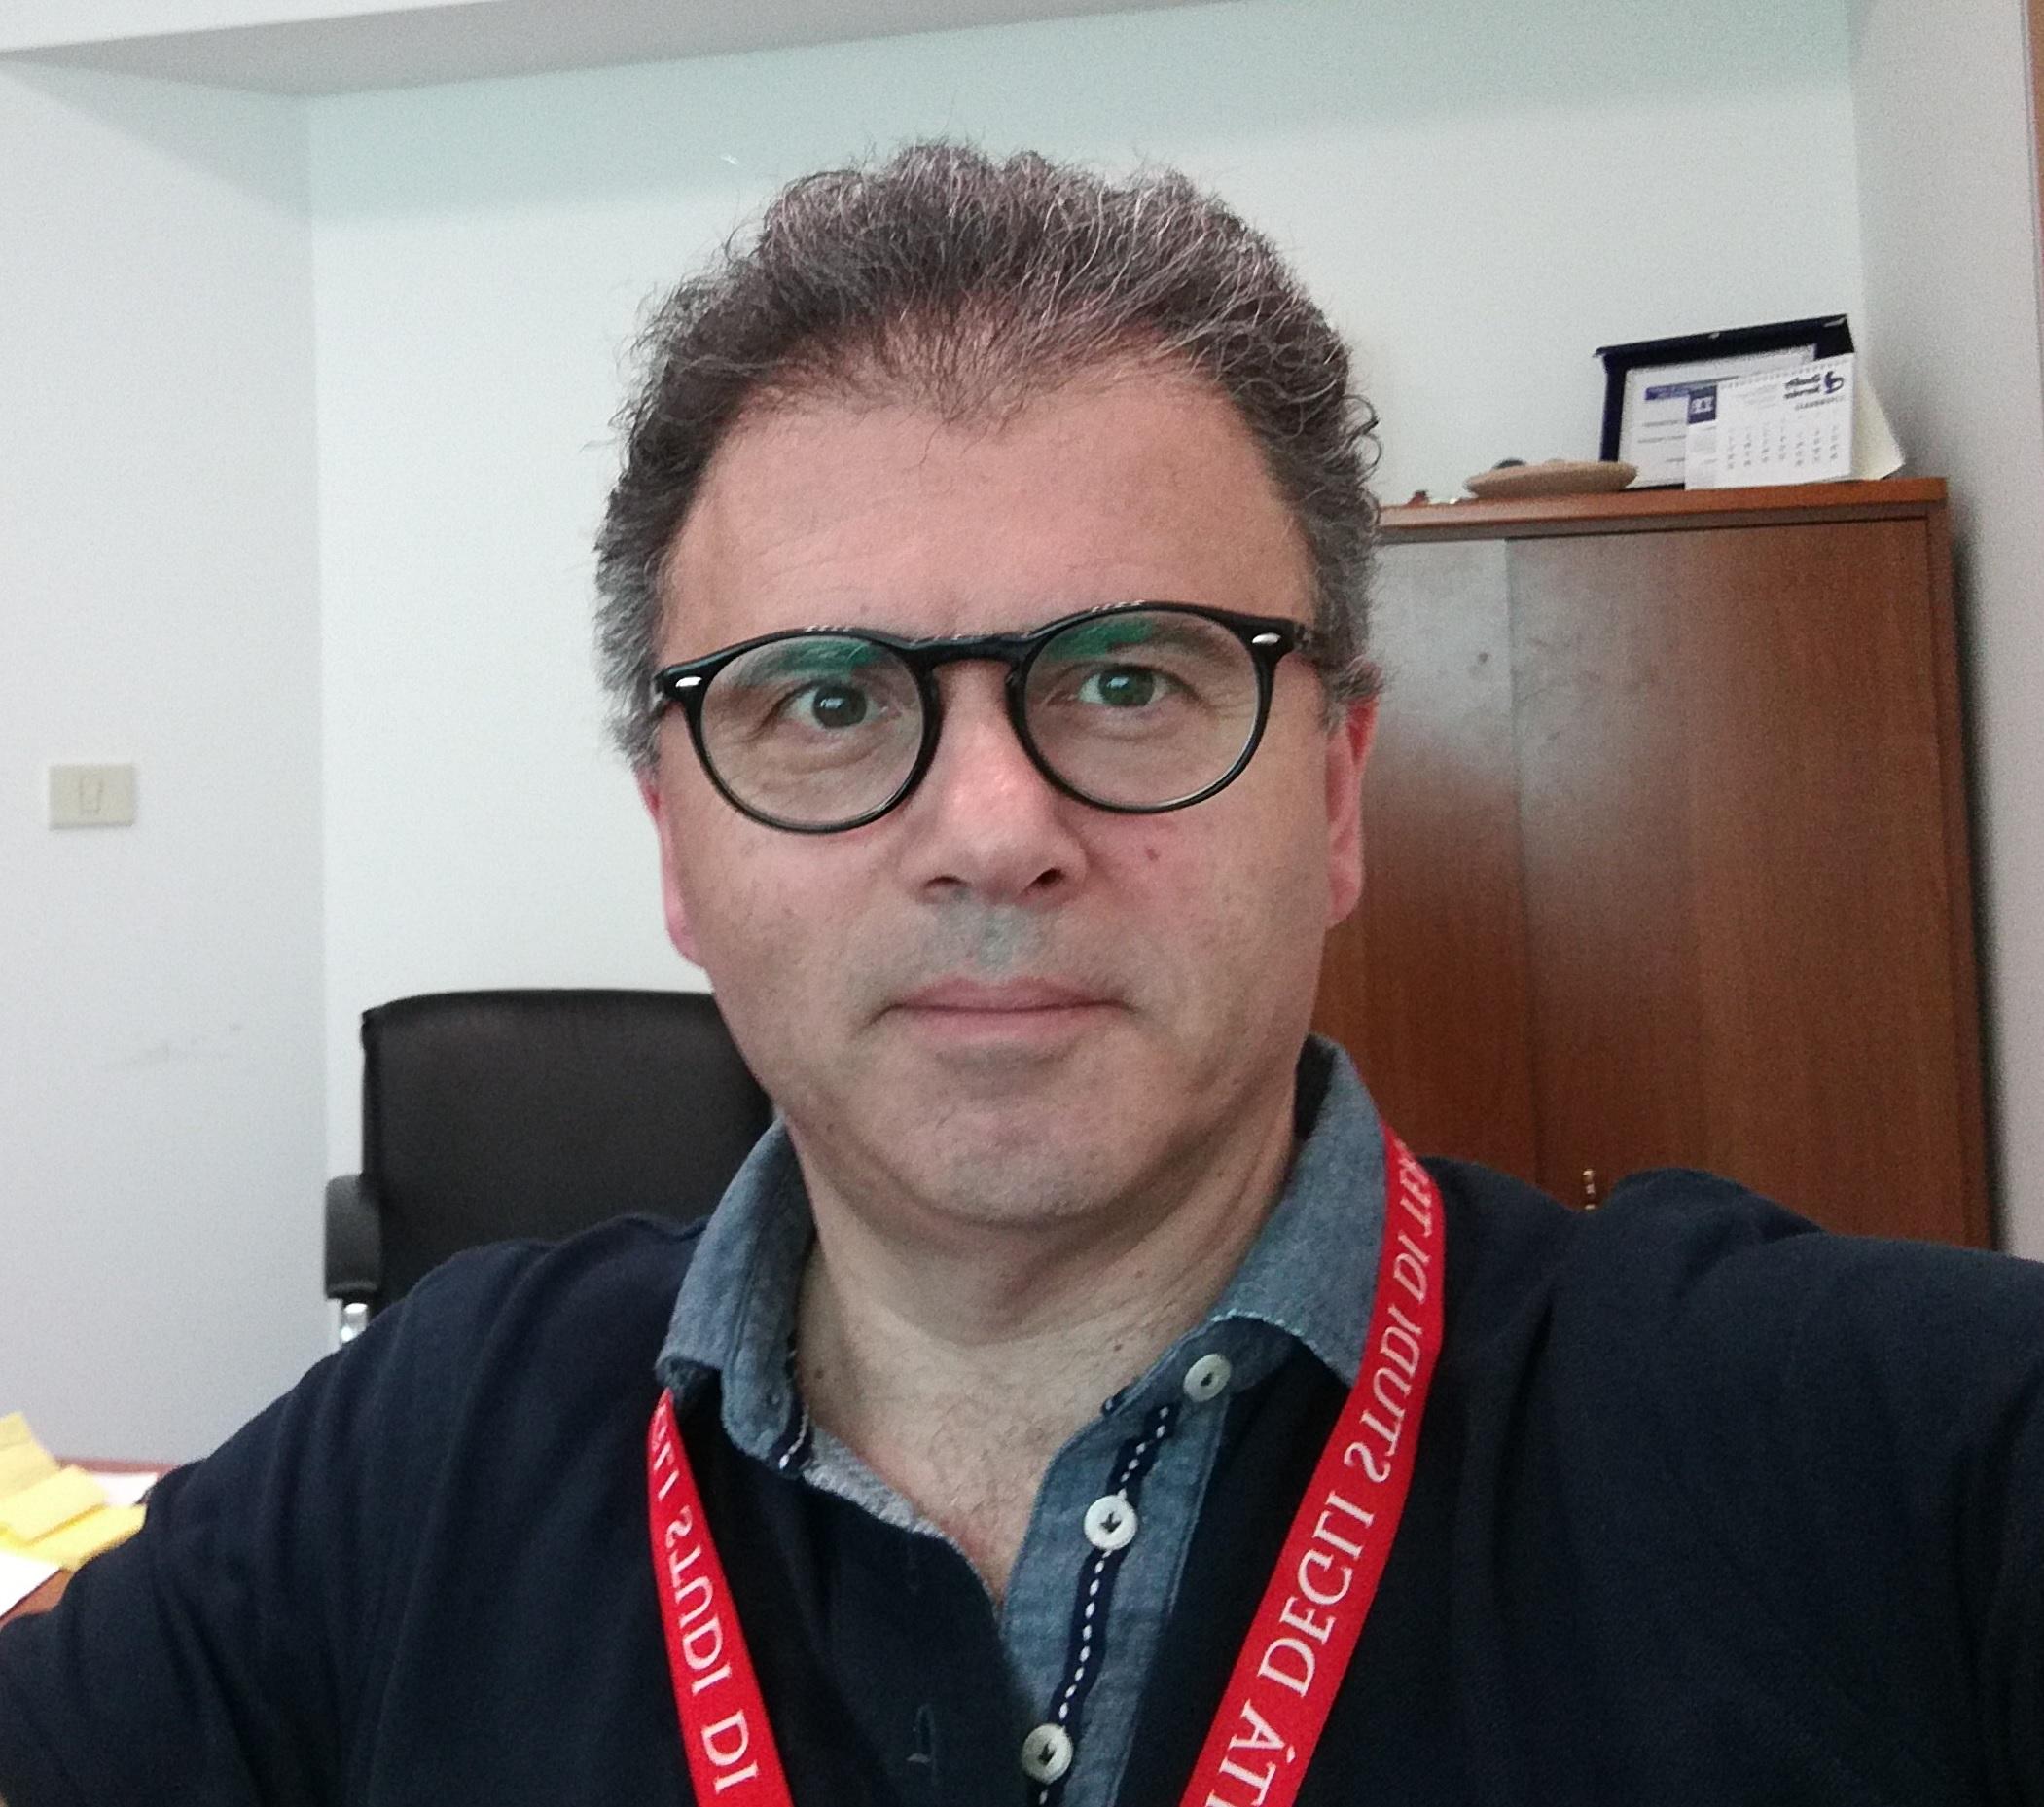 Prof. COMPAGNONE Dario